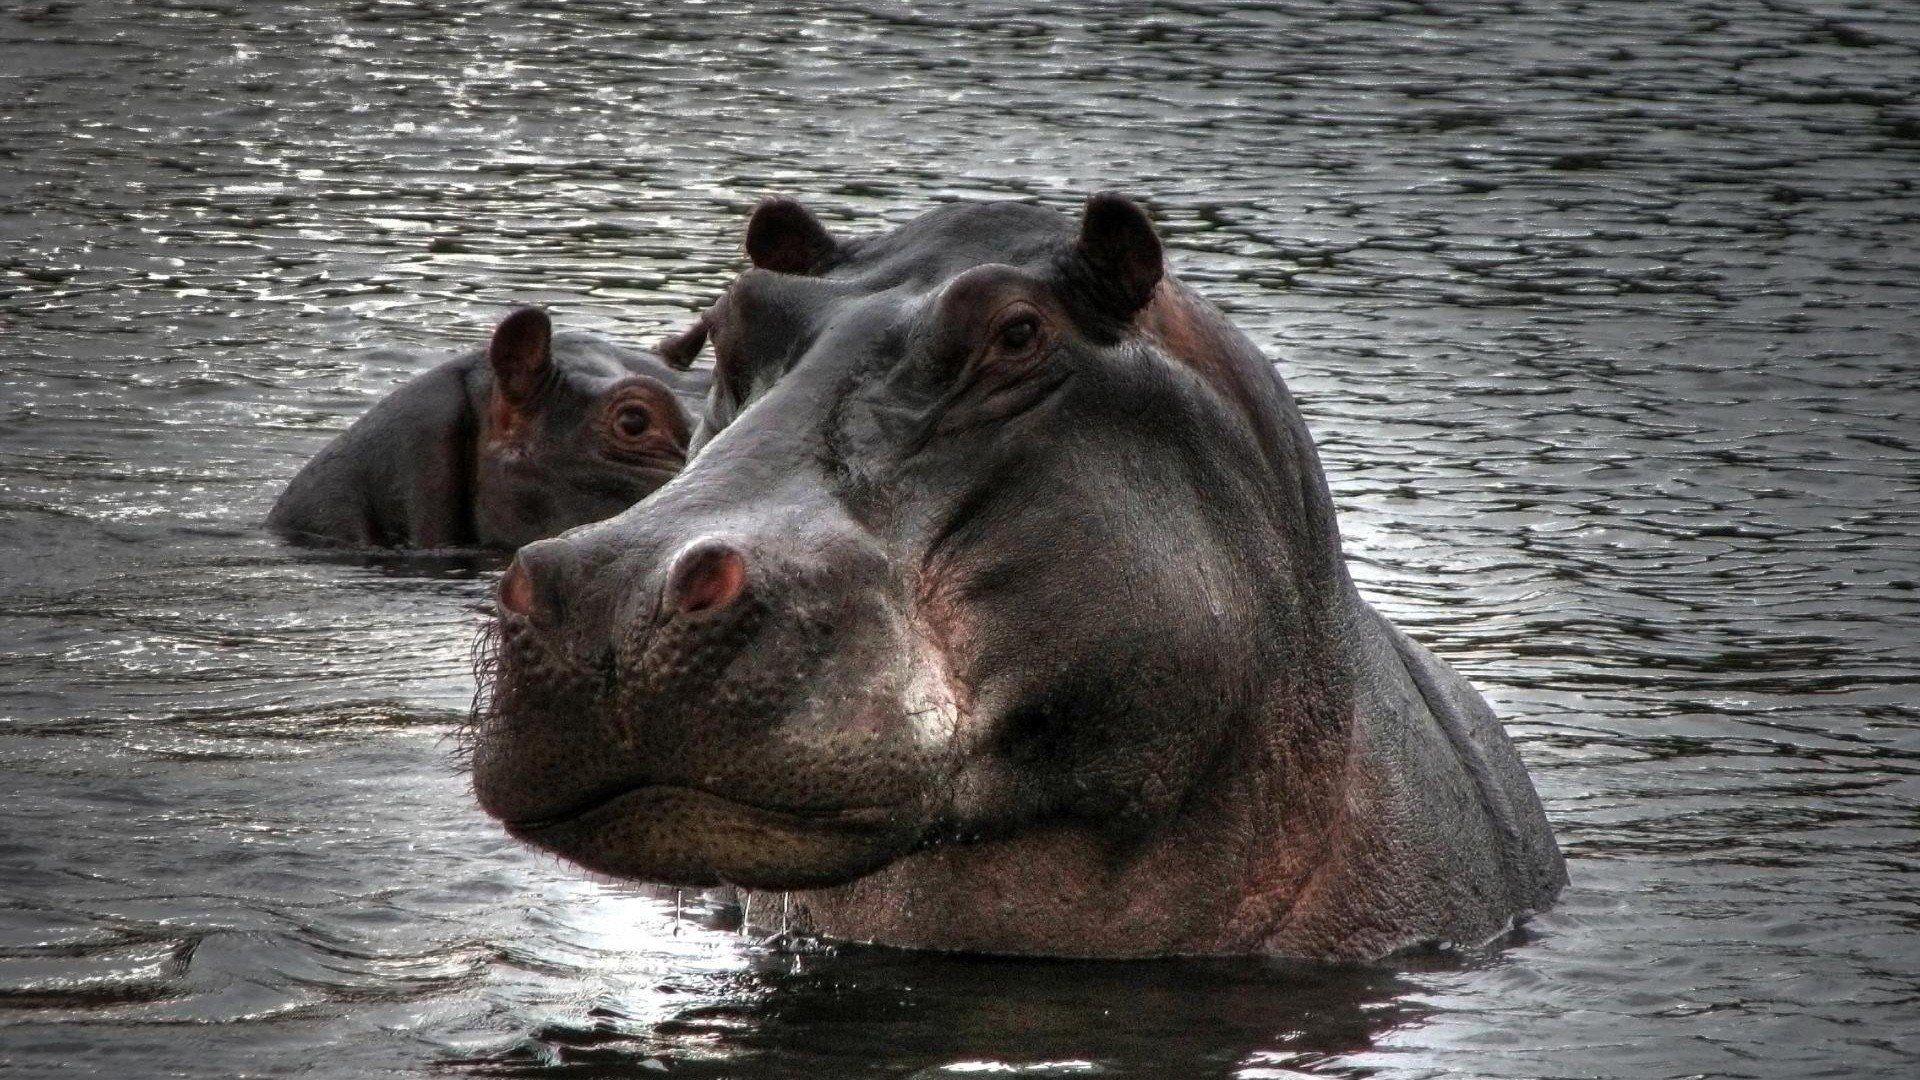 The Hippo Photo